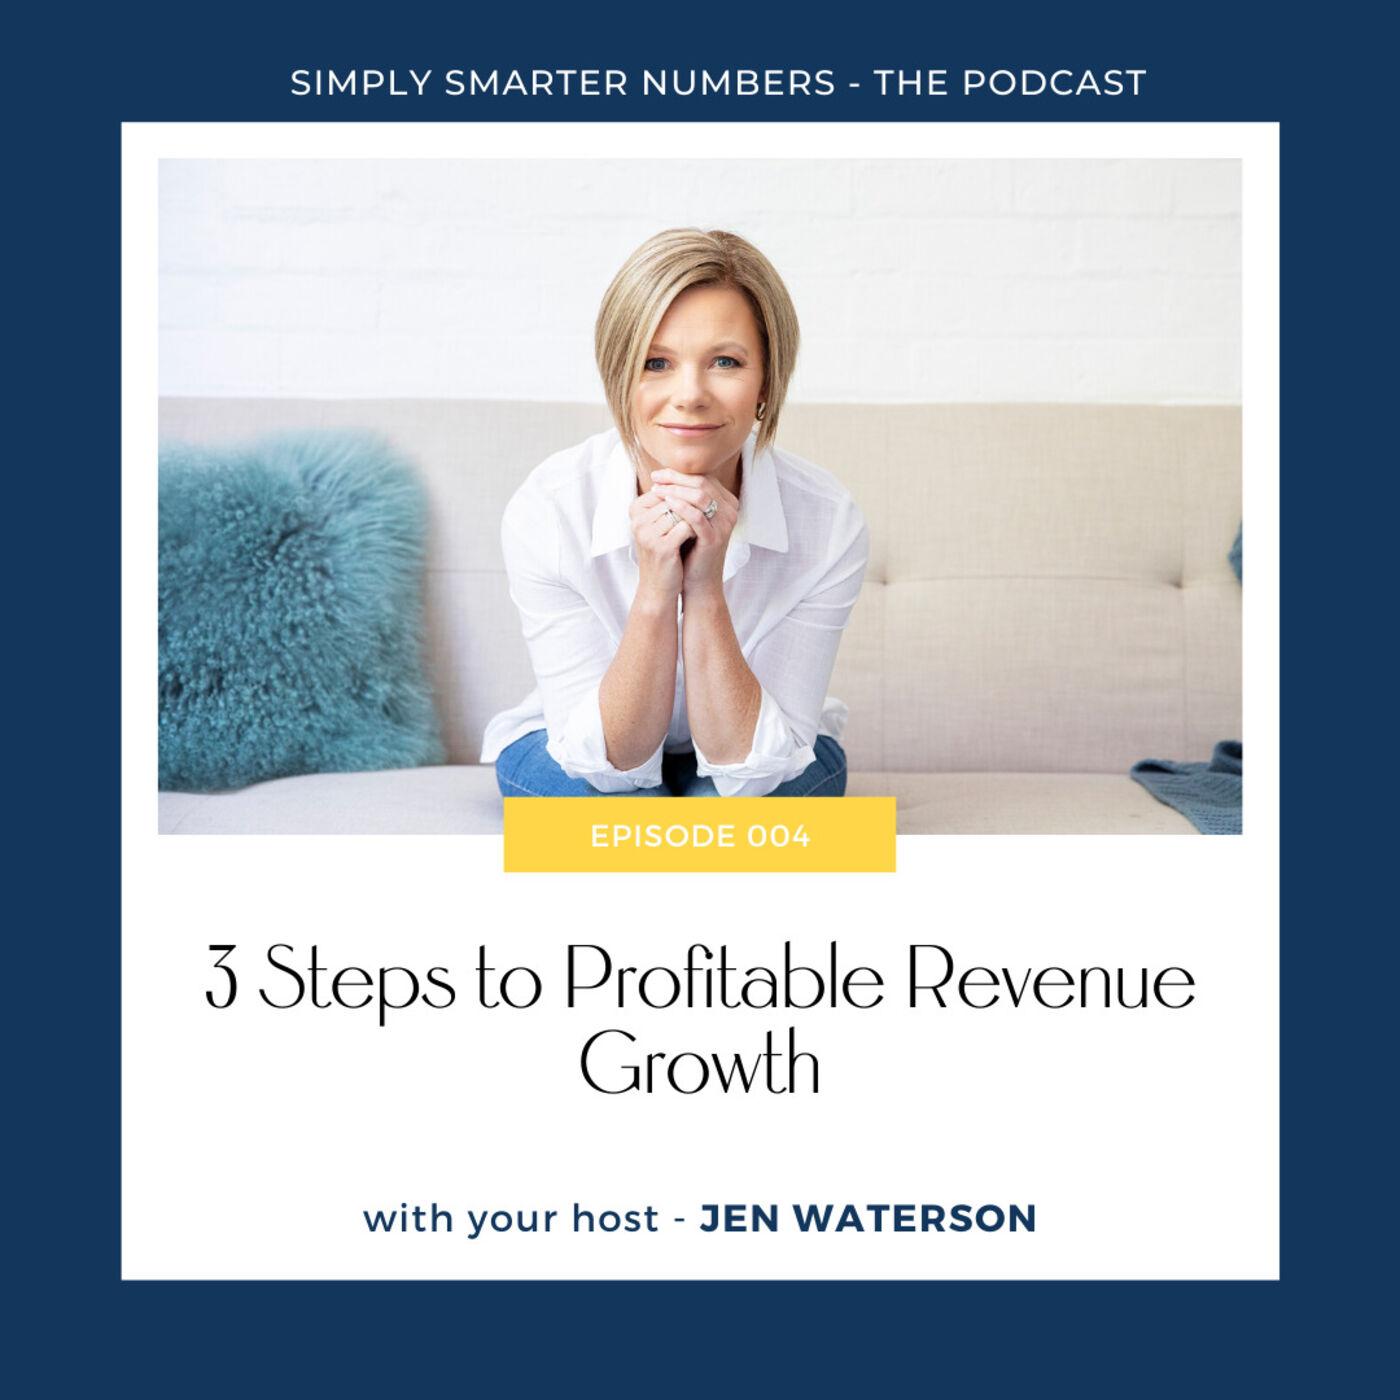 3 Steps To Profitable Revenue Growth